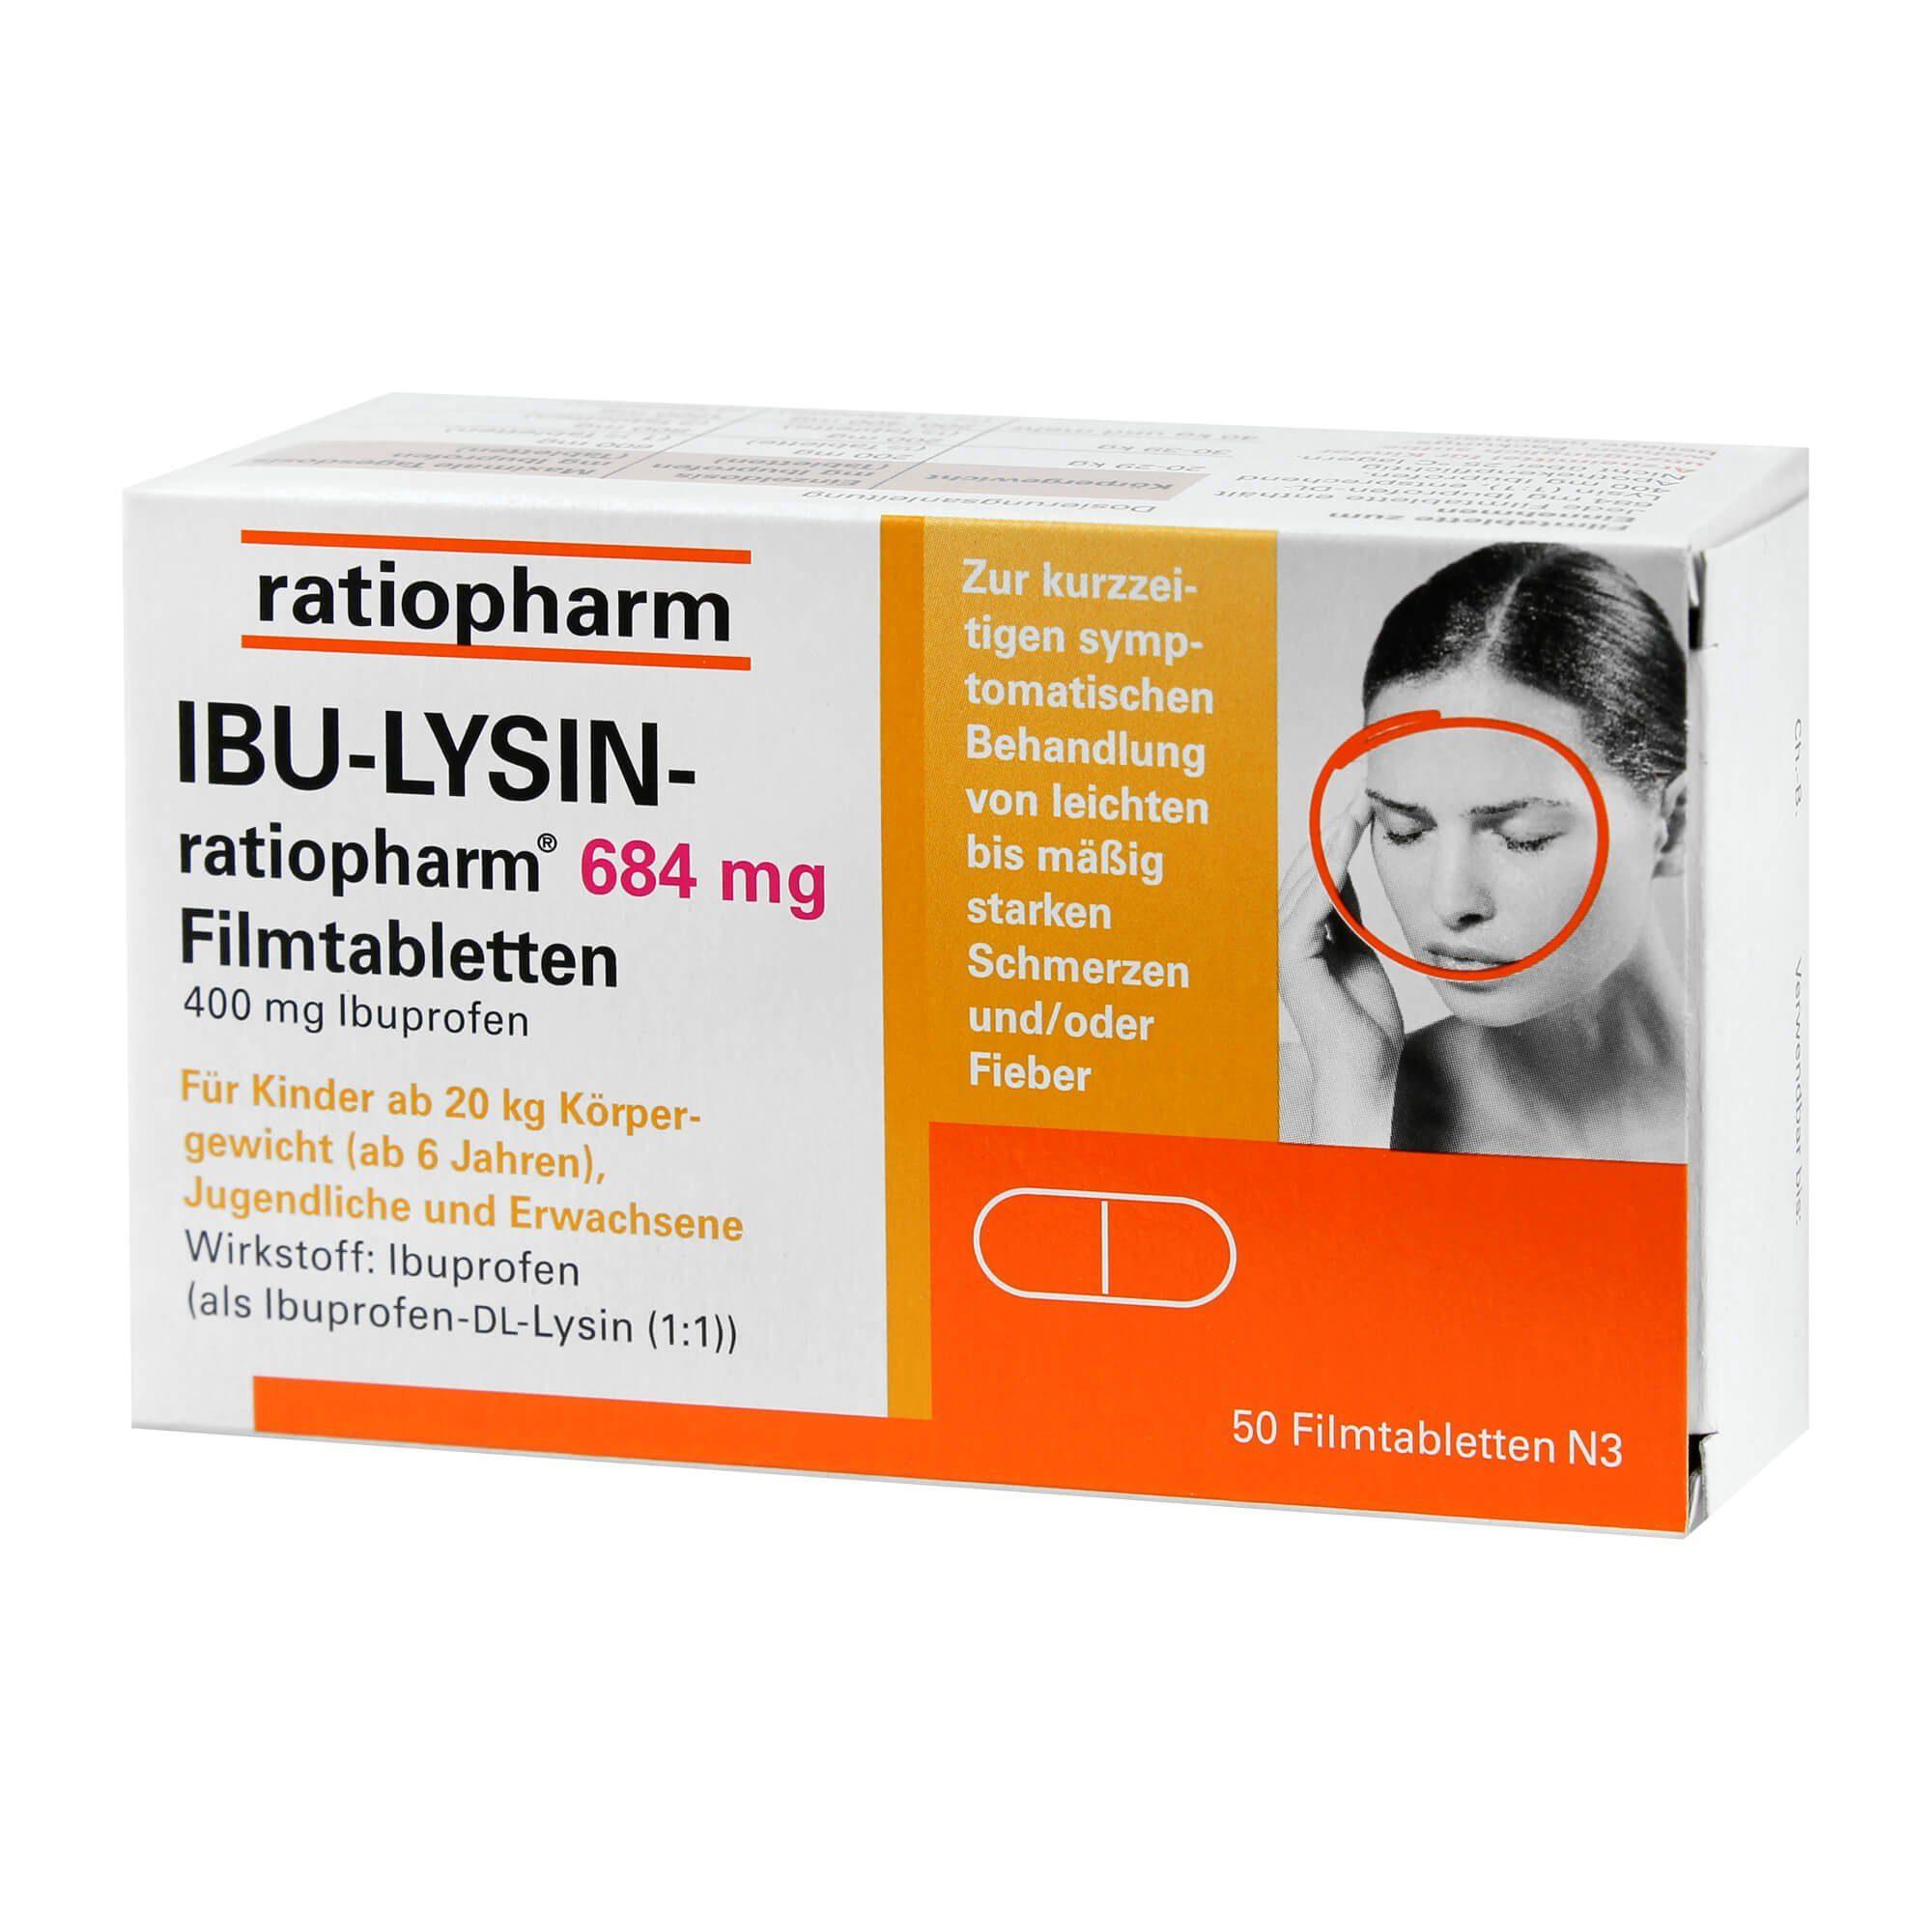 IBU-LYSIN-ratiopharm 684 mg, 50 St